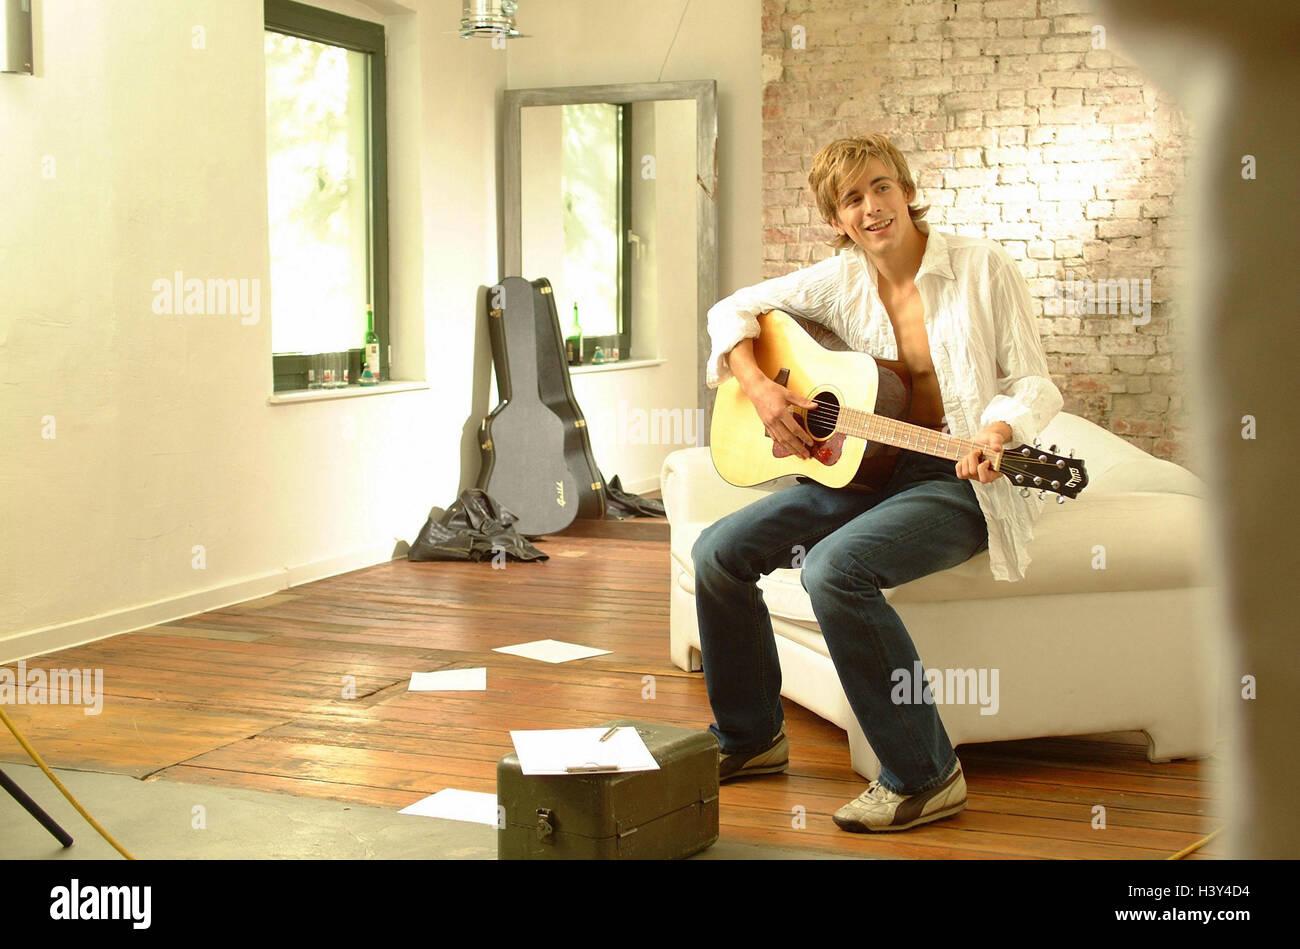 Loft, Gitarrist, Wohnfläche, Mann, jung, Gitarre, spielen, Gitarrist, Musik, musizieren, komponieren, Musikinstrument, Stockbild